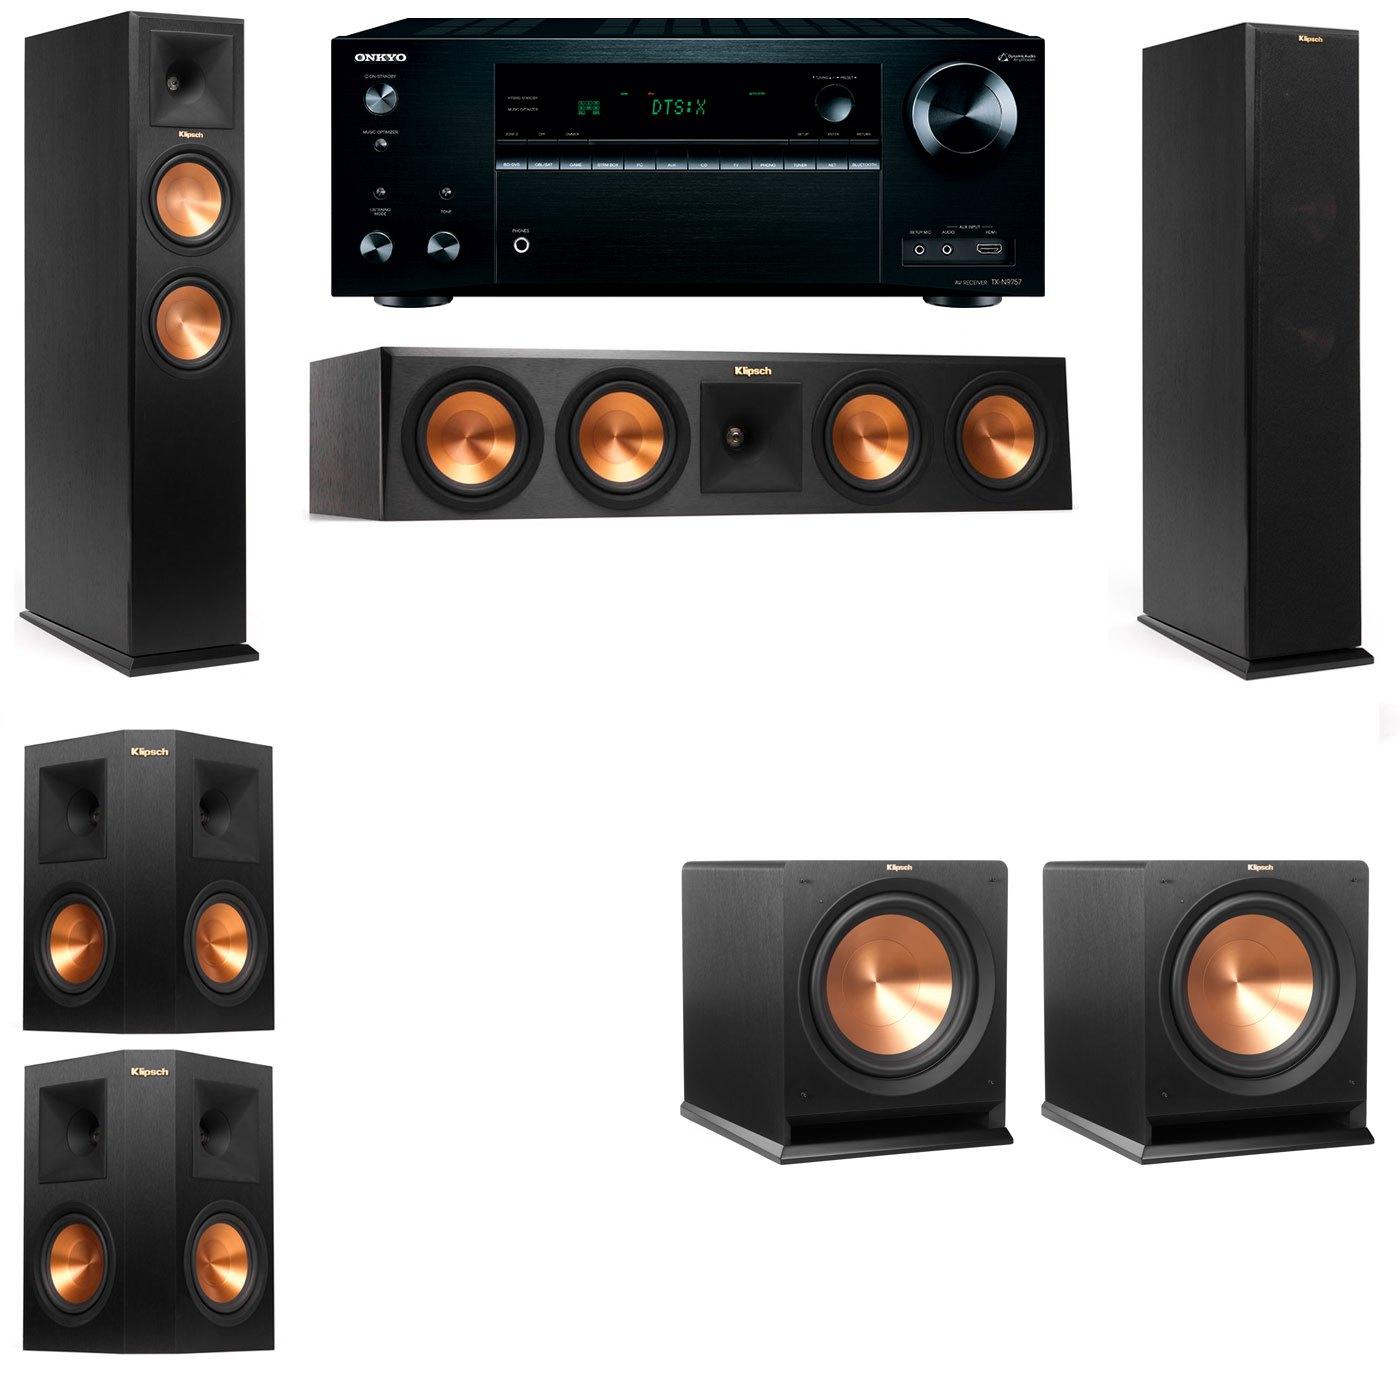 Klipsch RP-250F Tower Speakers-R112SW-5.2-Onkyo TX-NR757